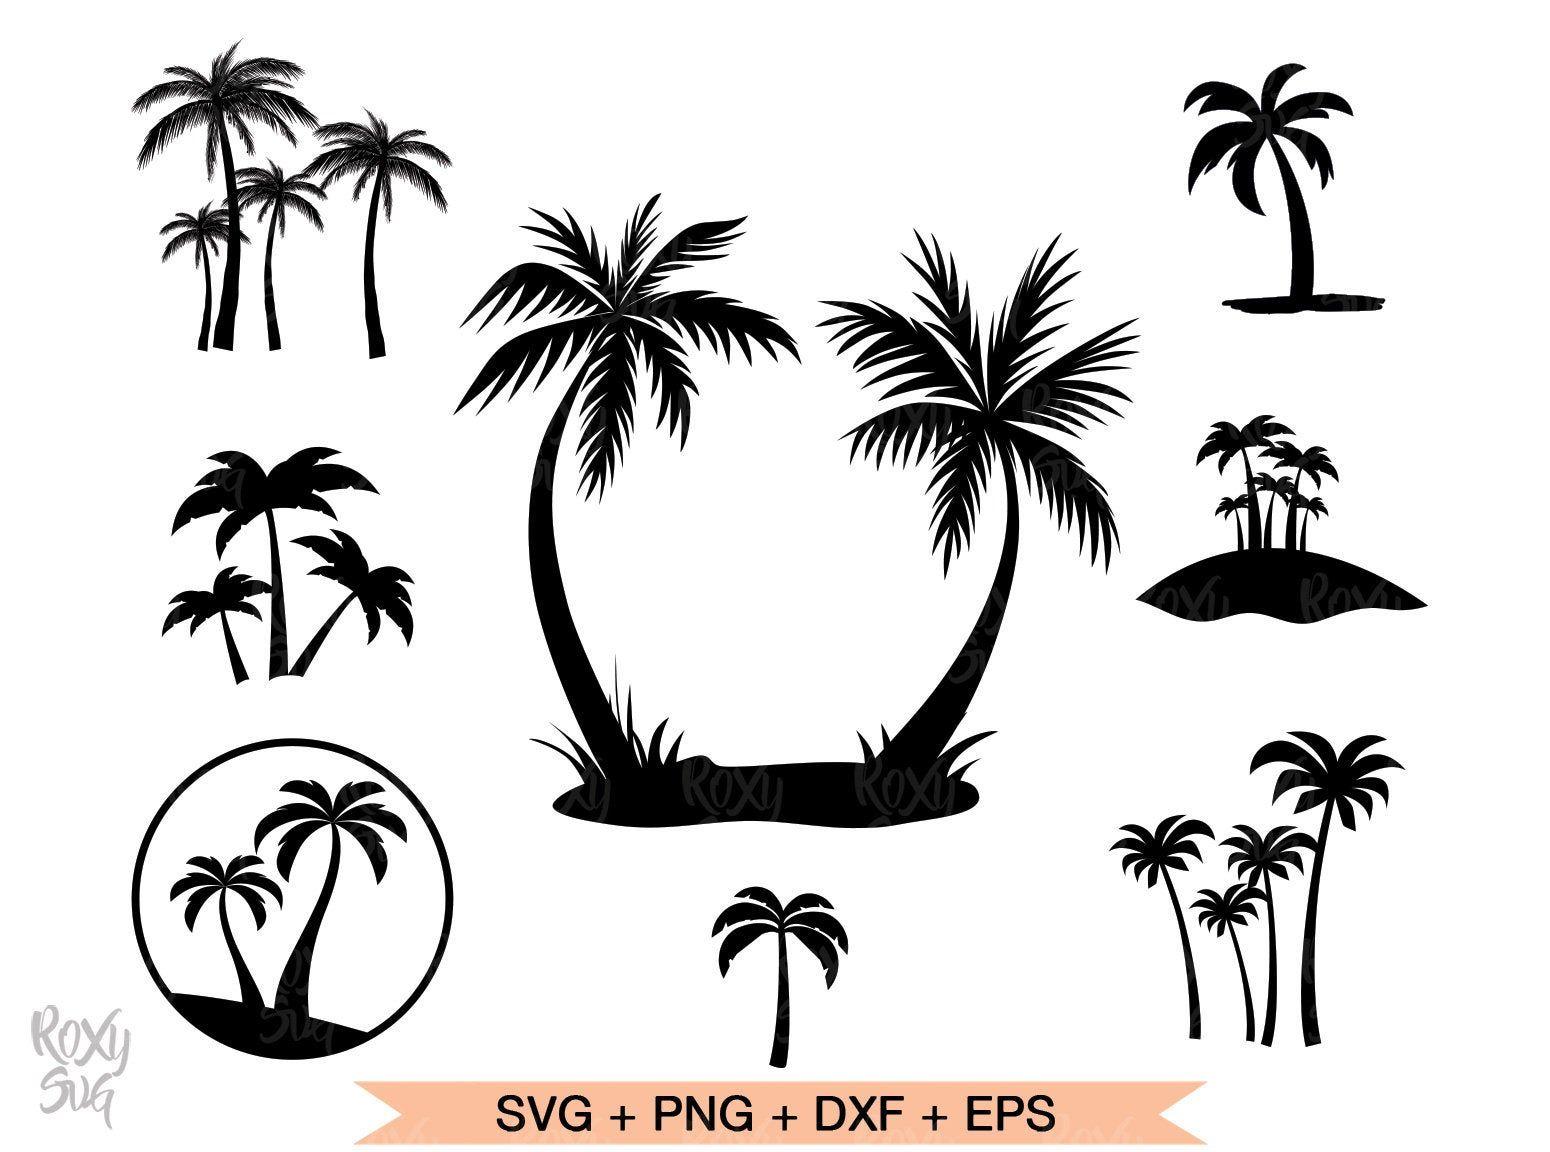 Palm Tree Svg Summer Svg Palm Tree Bundle Svg Palm Tree Clipart Palm Tree Silhouette Svg Files For Cricut Svg Eps Dxf Png Files Palm Tree Vector Palm Tree Drawing Palm